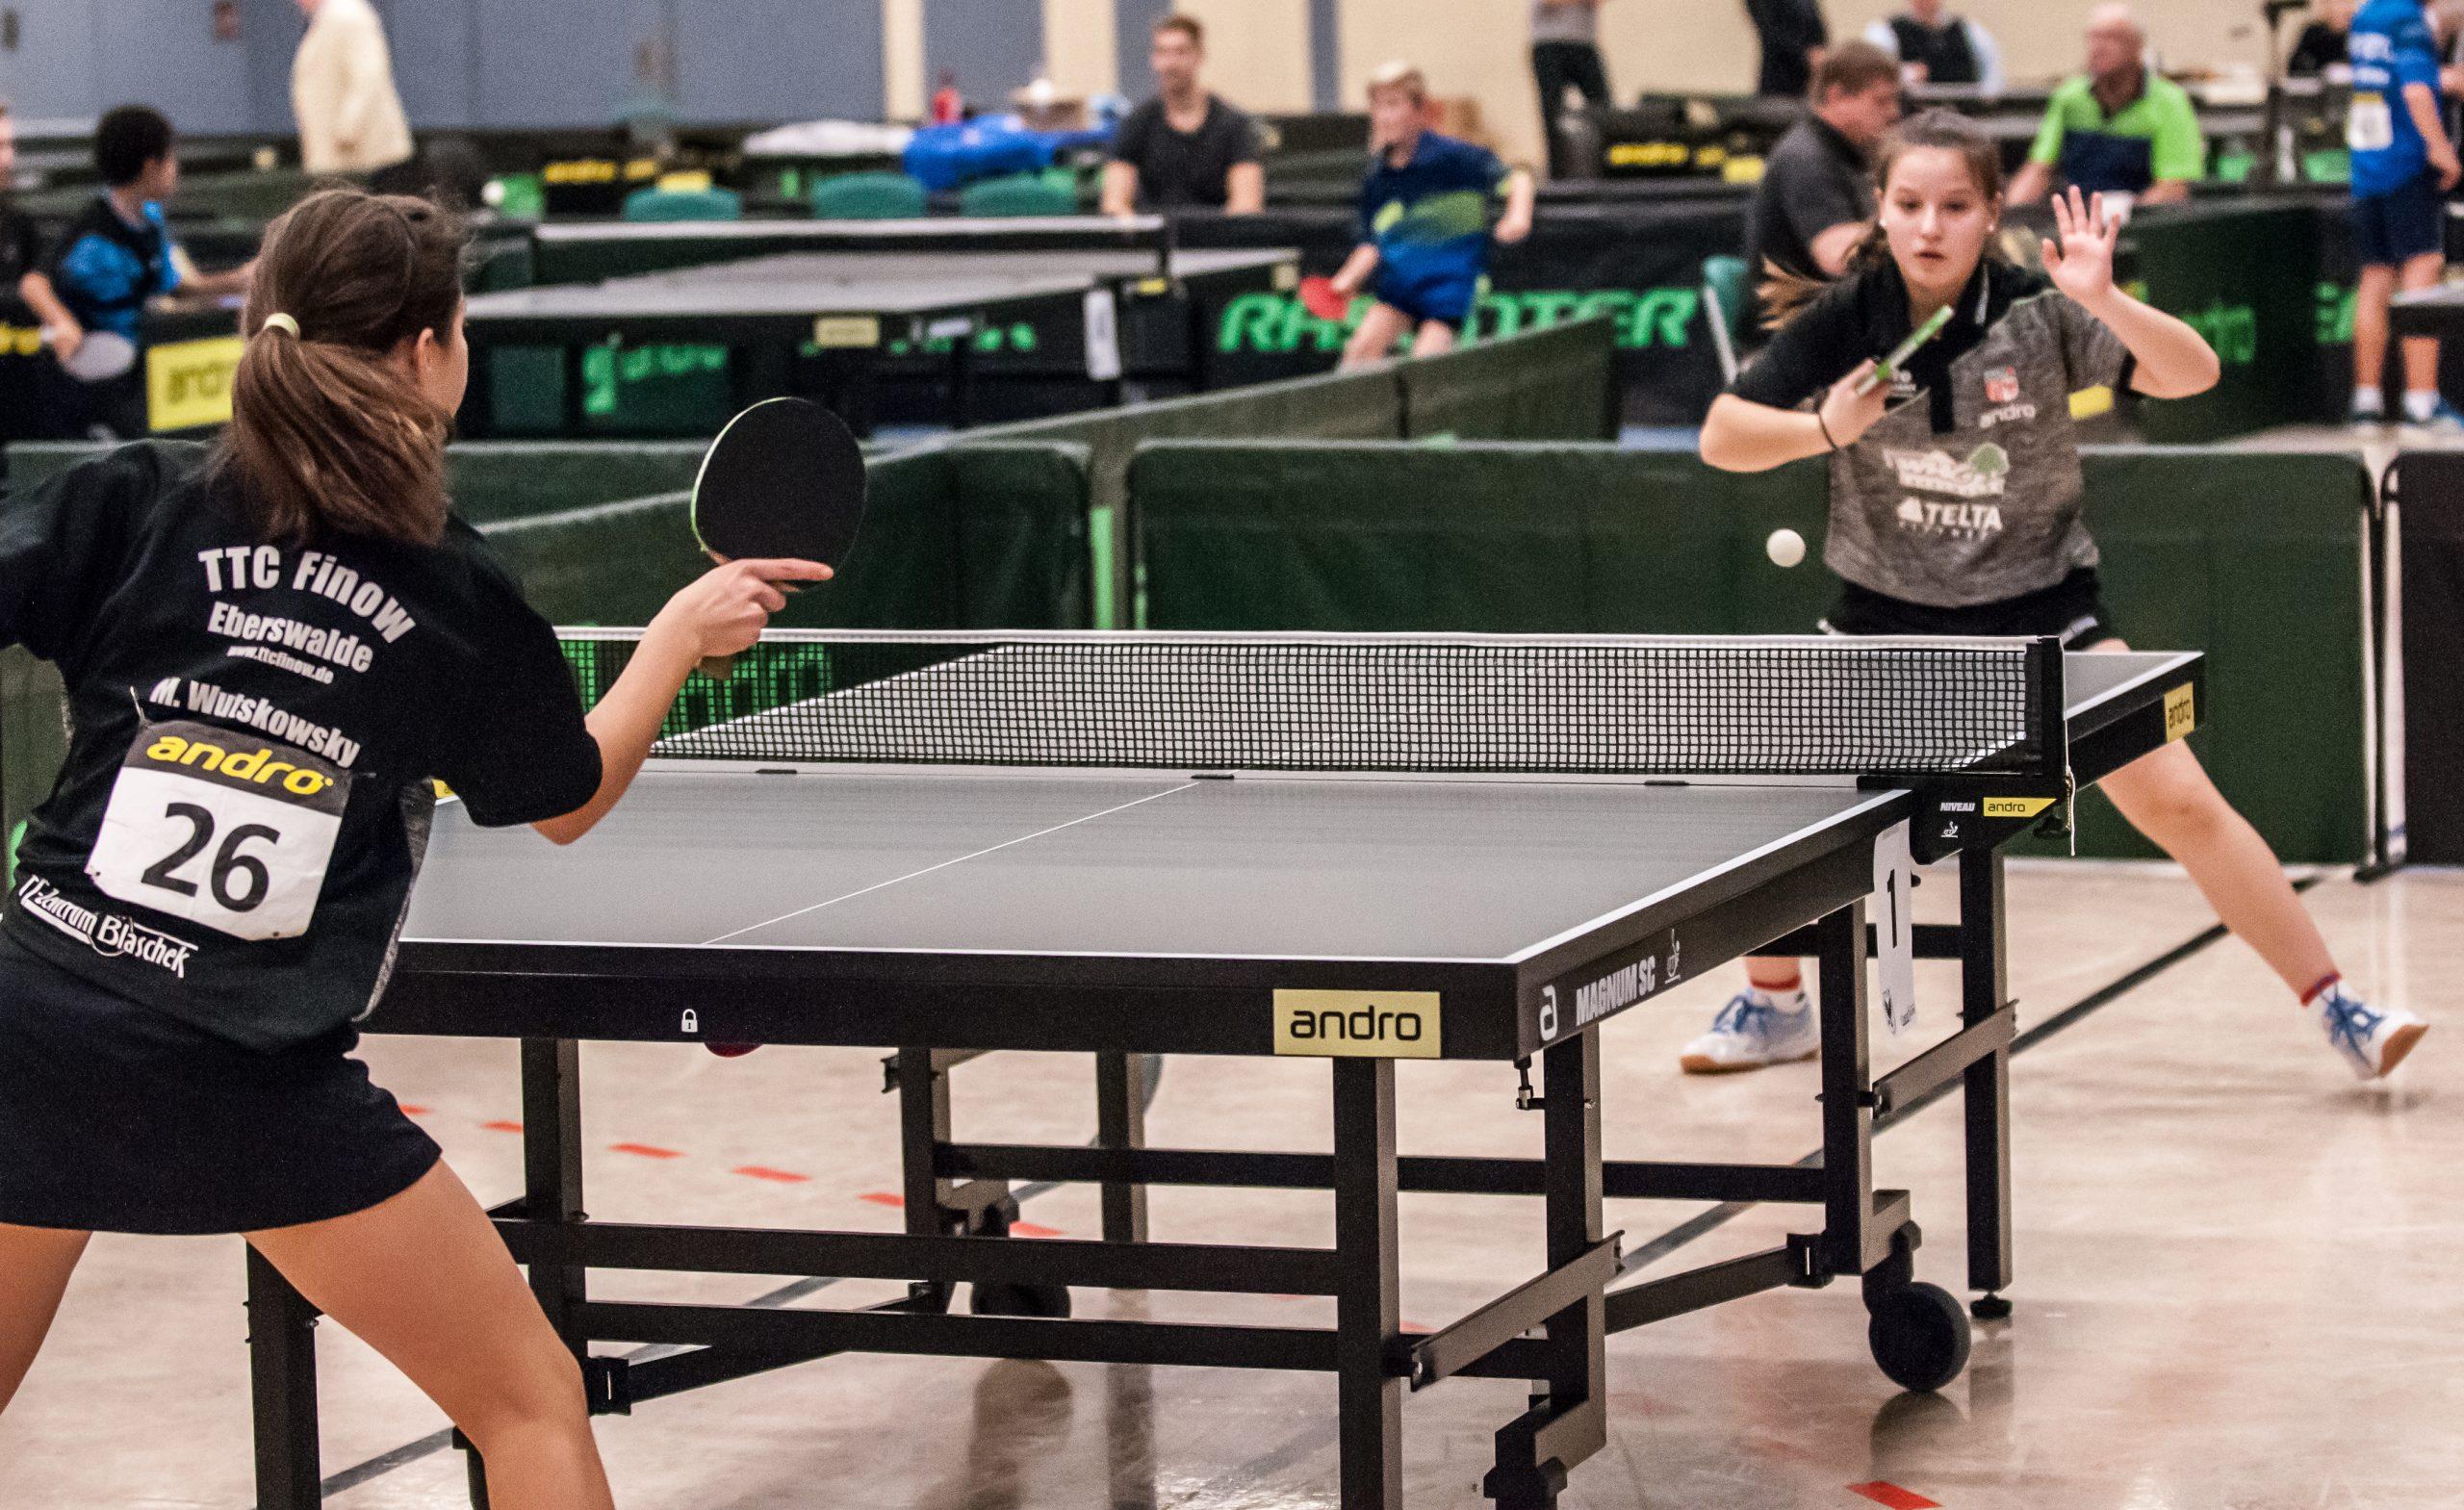 Finale bei den A-Schülerinnen Michelle Wutskowsky gegen Chiara Baltus